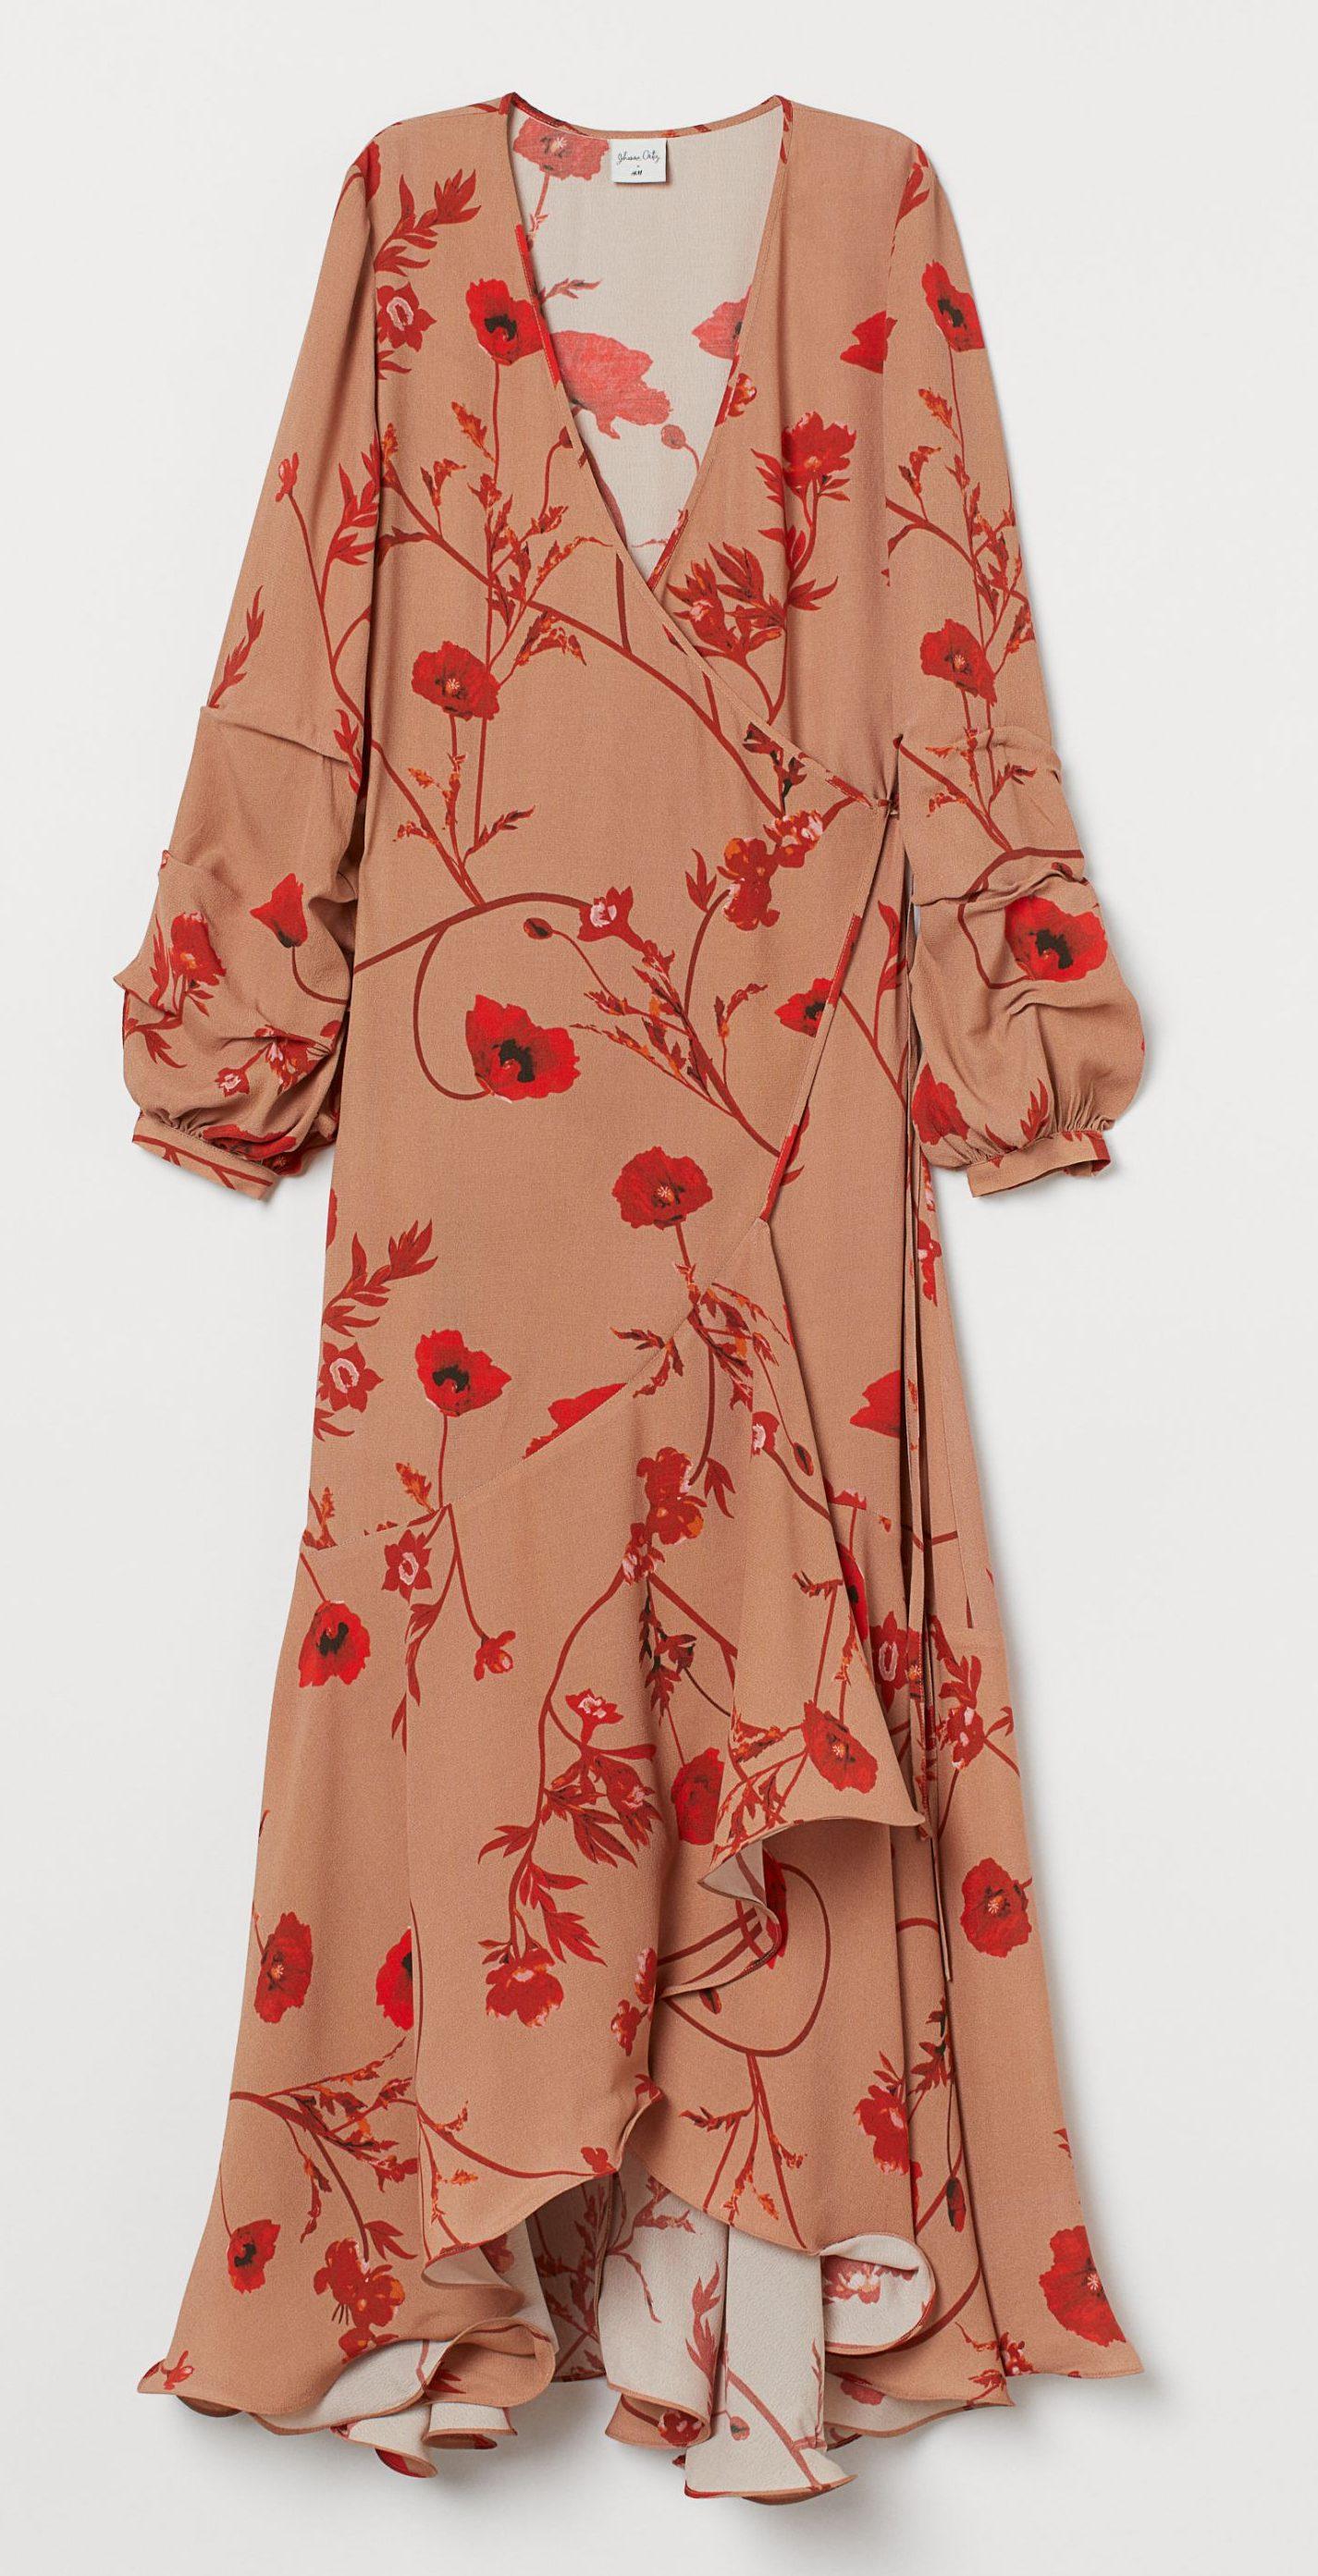 H&M, kjole. (Foto: Unsplash)